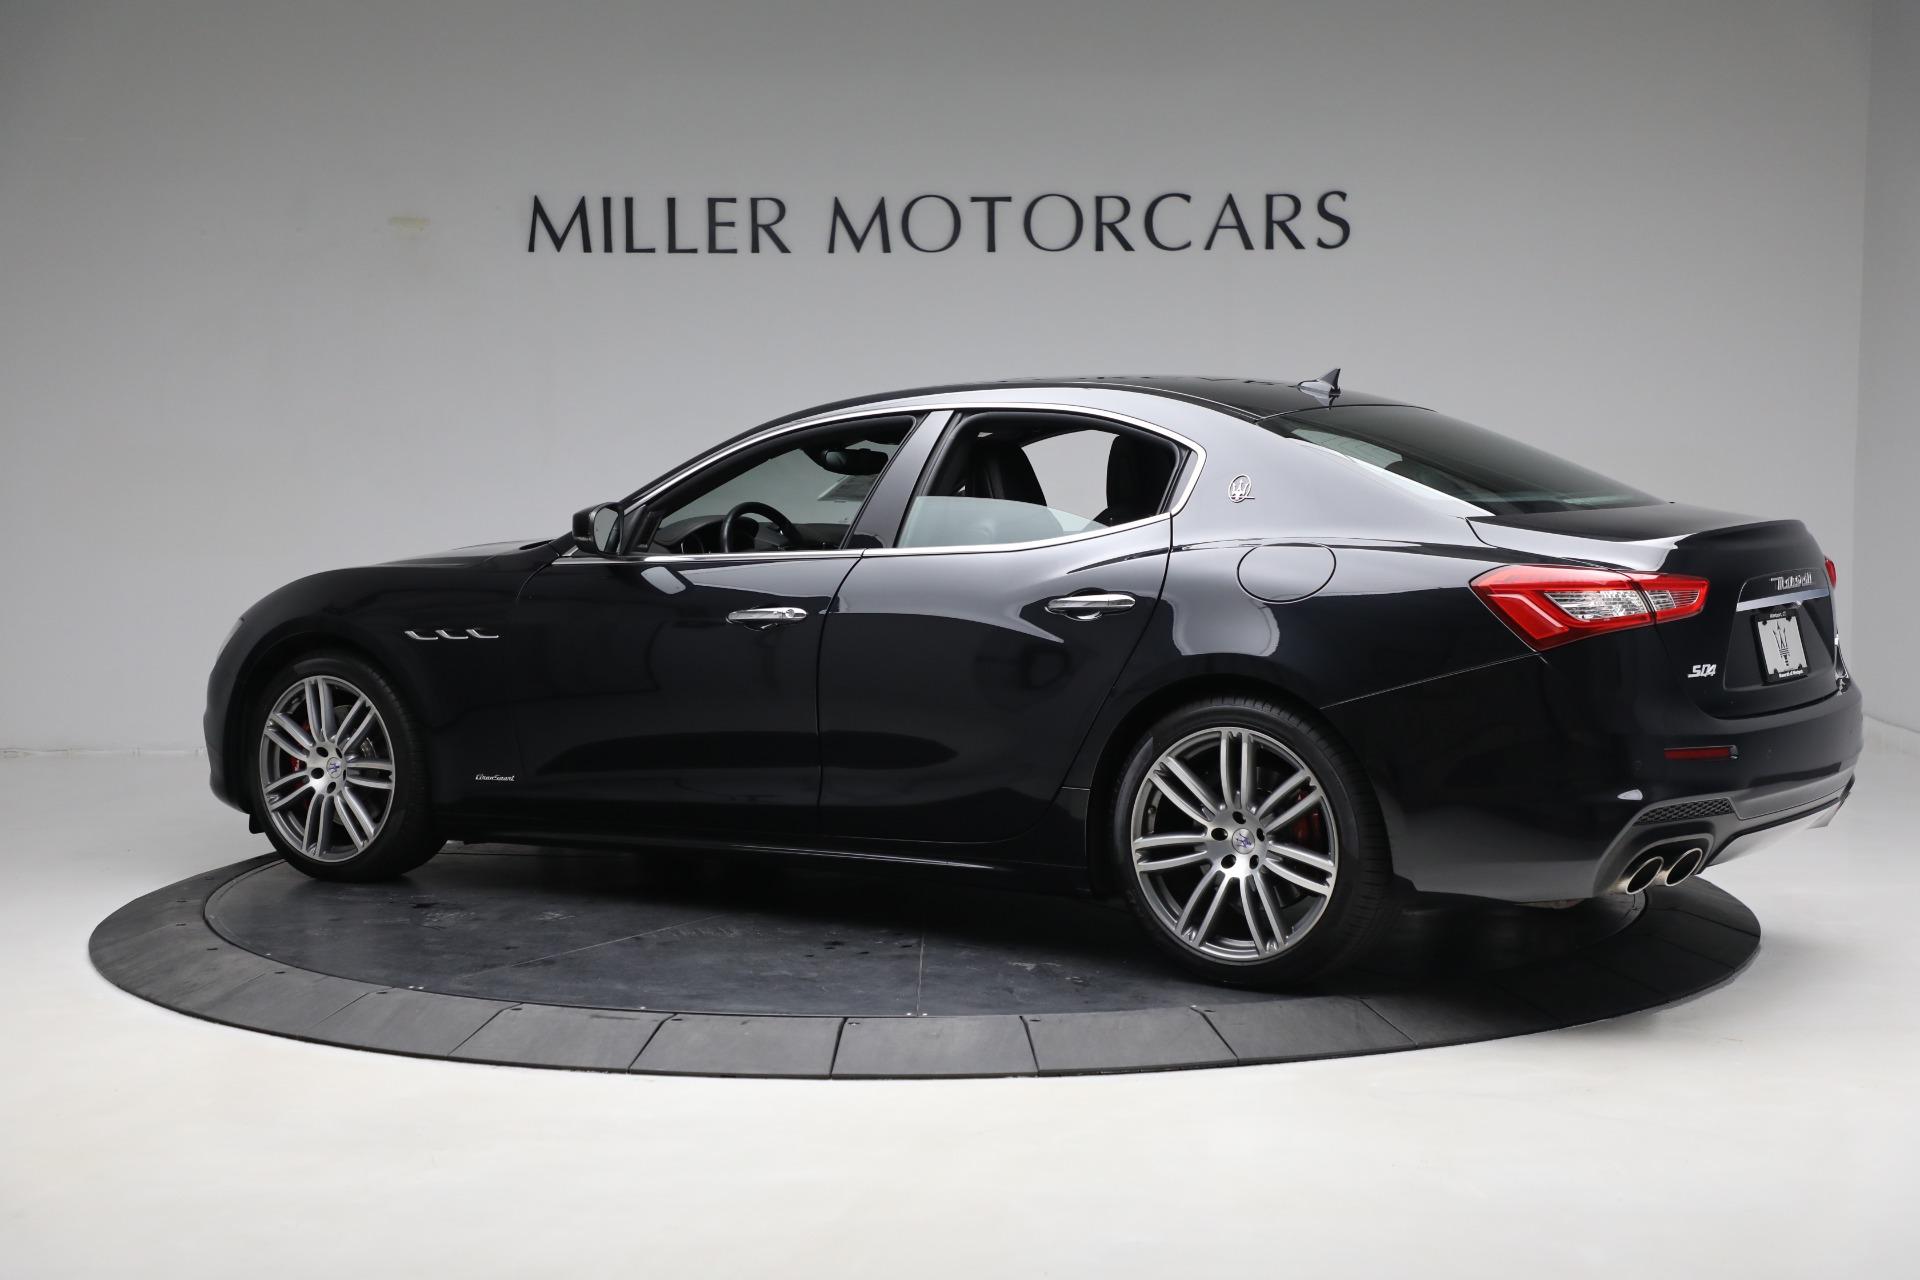 New 2019 Maserati Ghibli S Q4 GranSport For Sale In Greenwich, CT 2597_p4